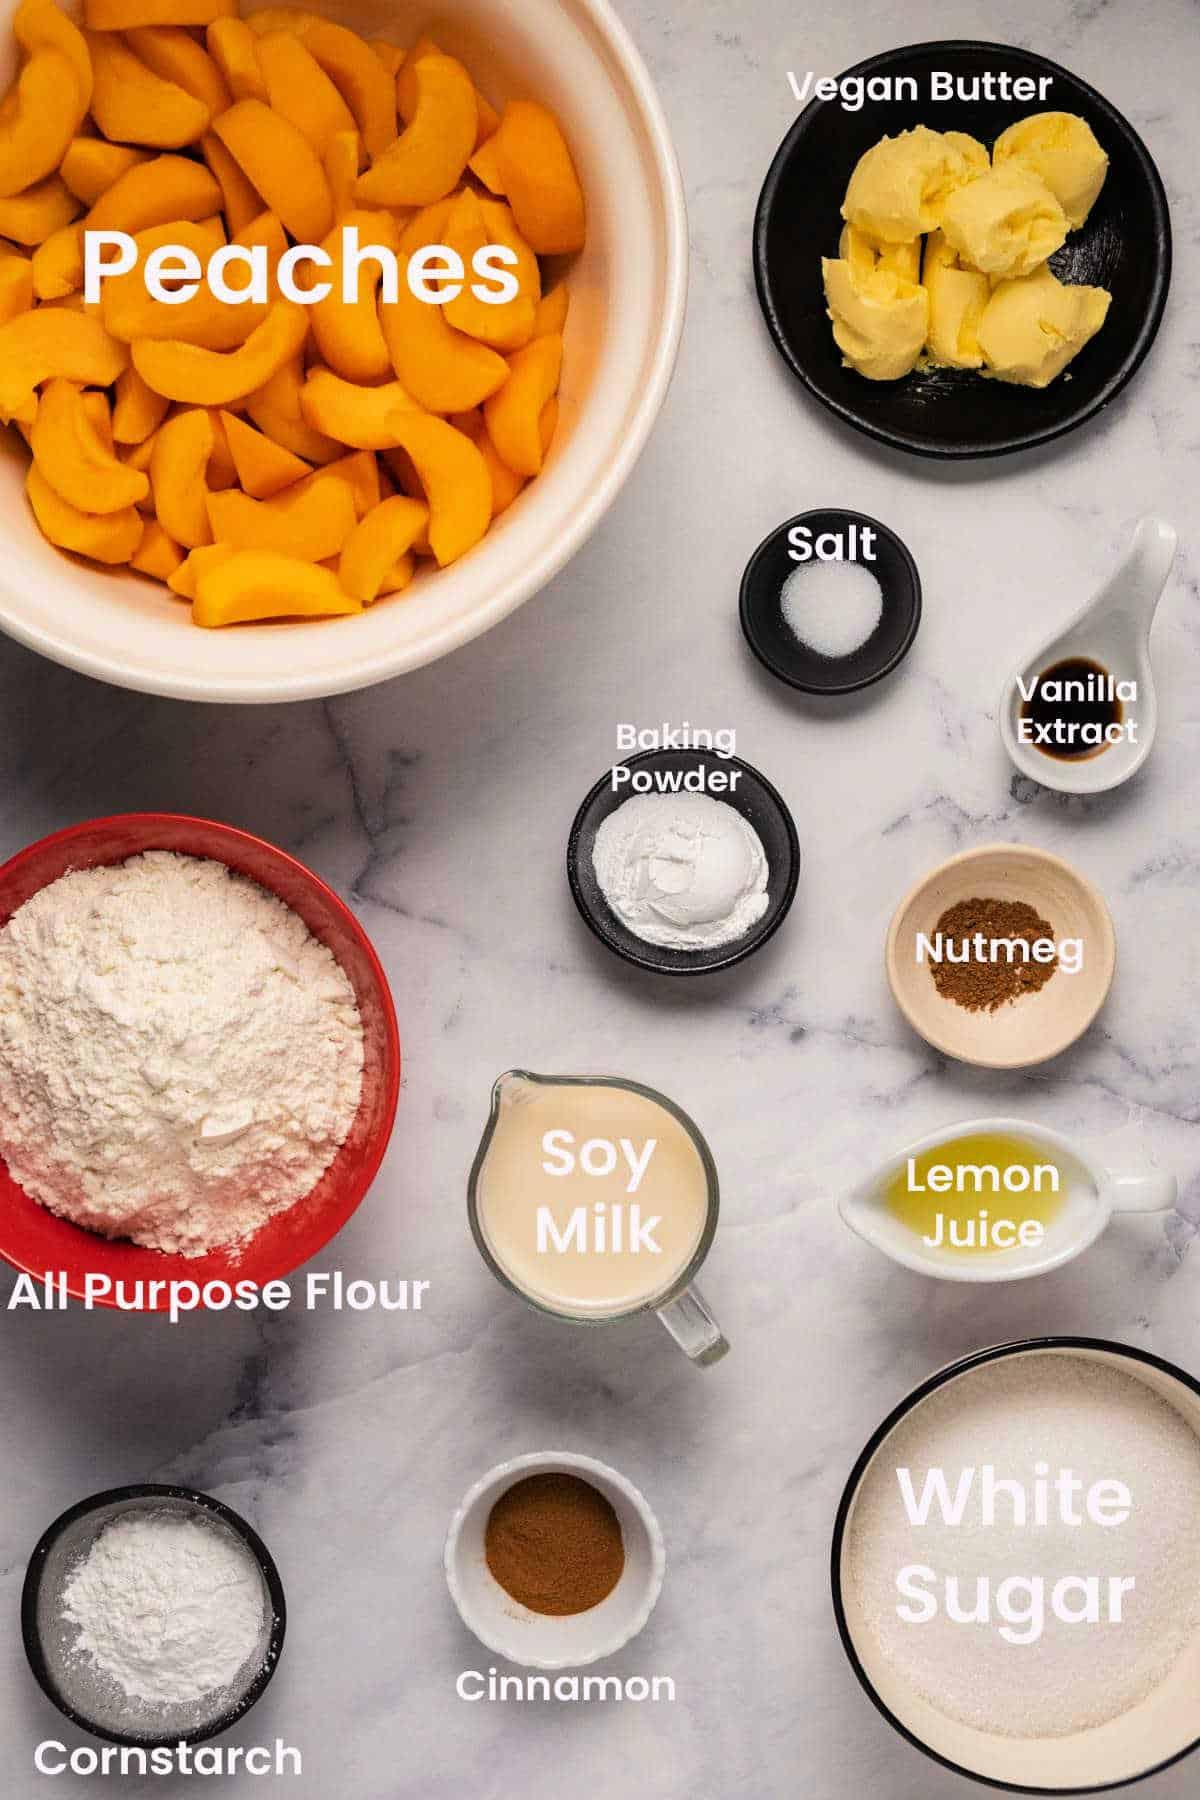 Ingredients to make a vegan peach cobbler.